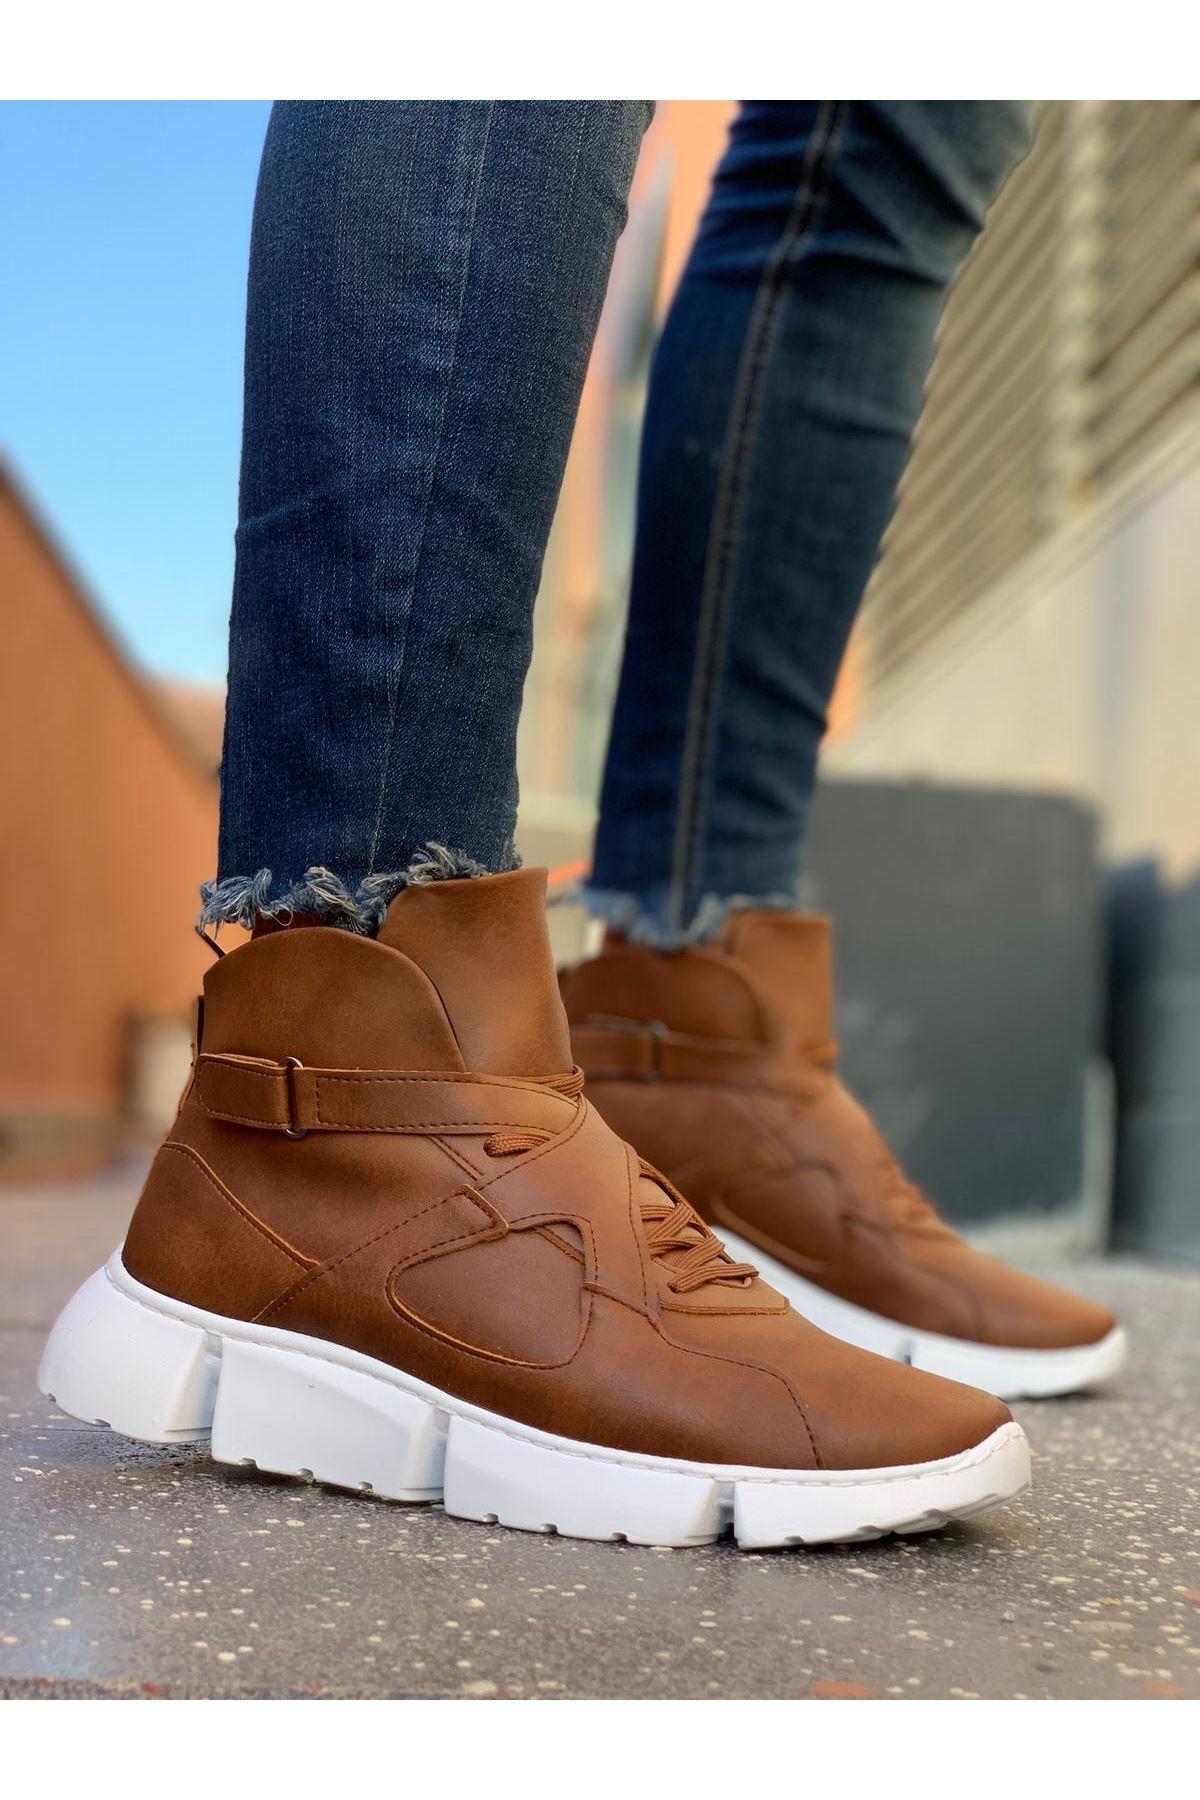 Chekich ch081 bt tan botas esportivas masculinas